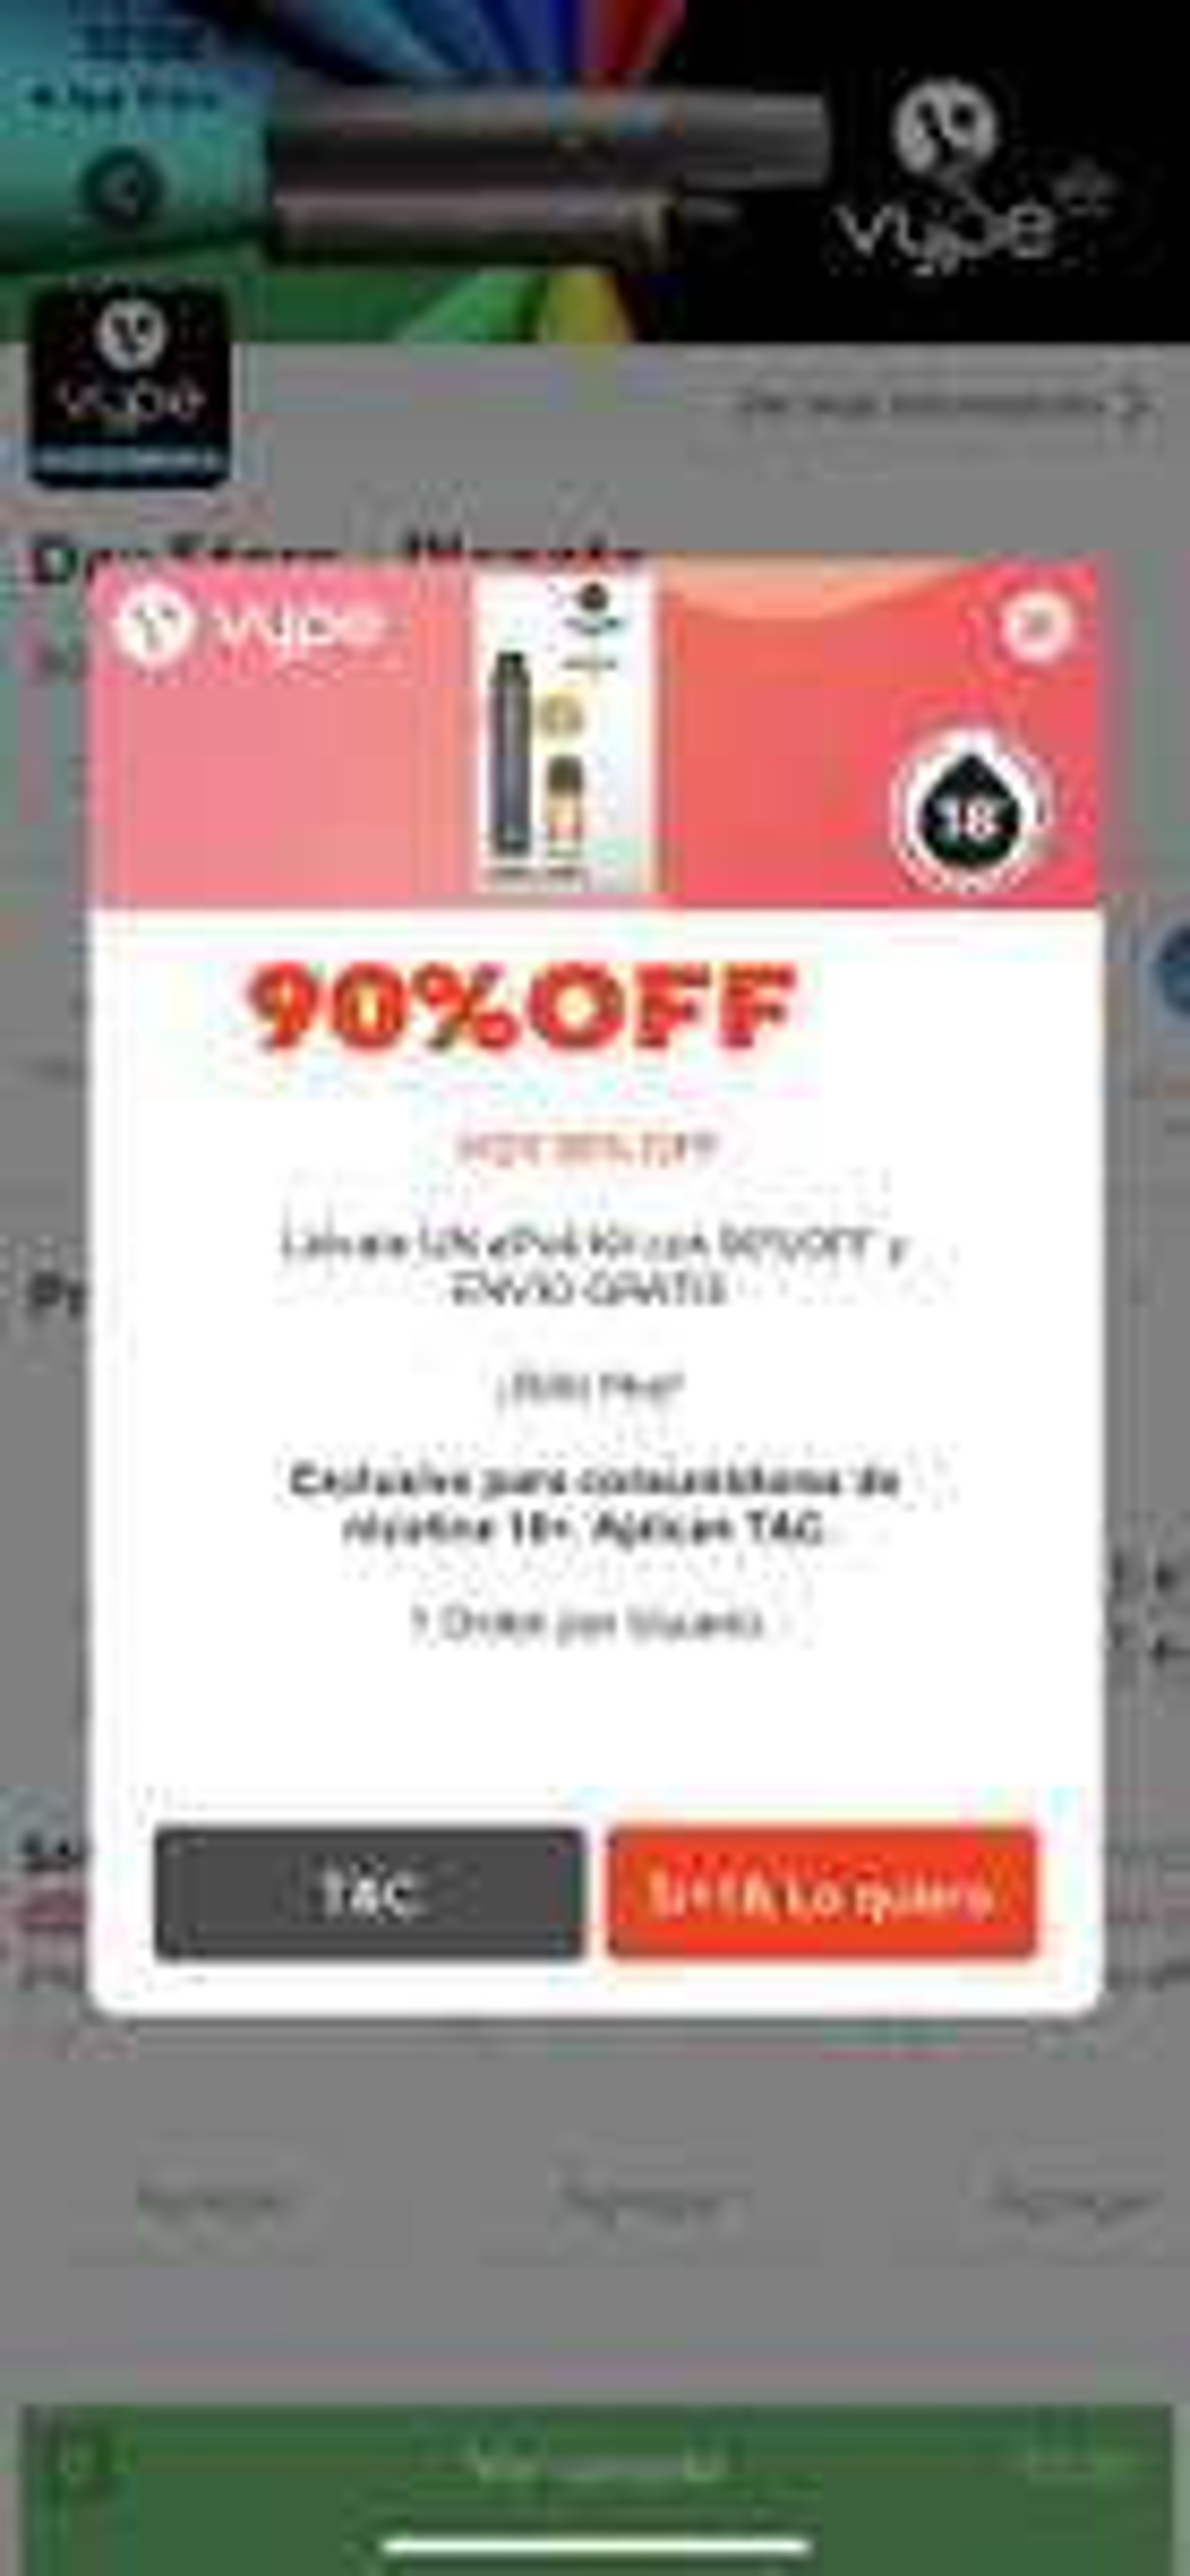 Rappi: Vype Kit ePod 90% y envío gratis